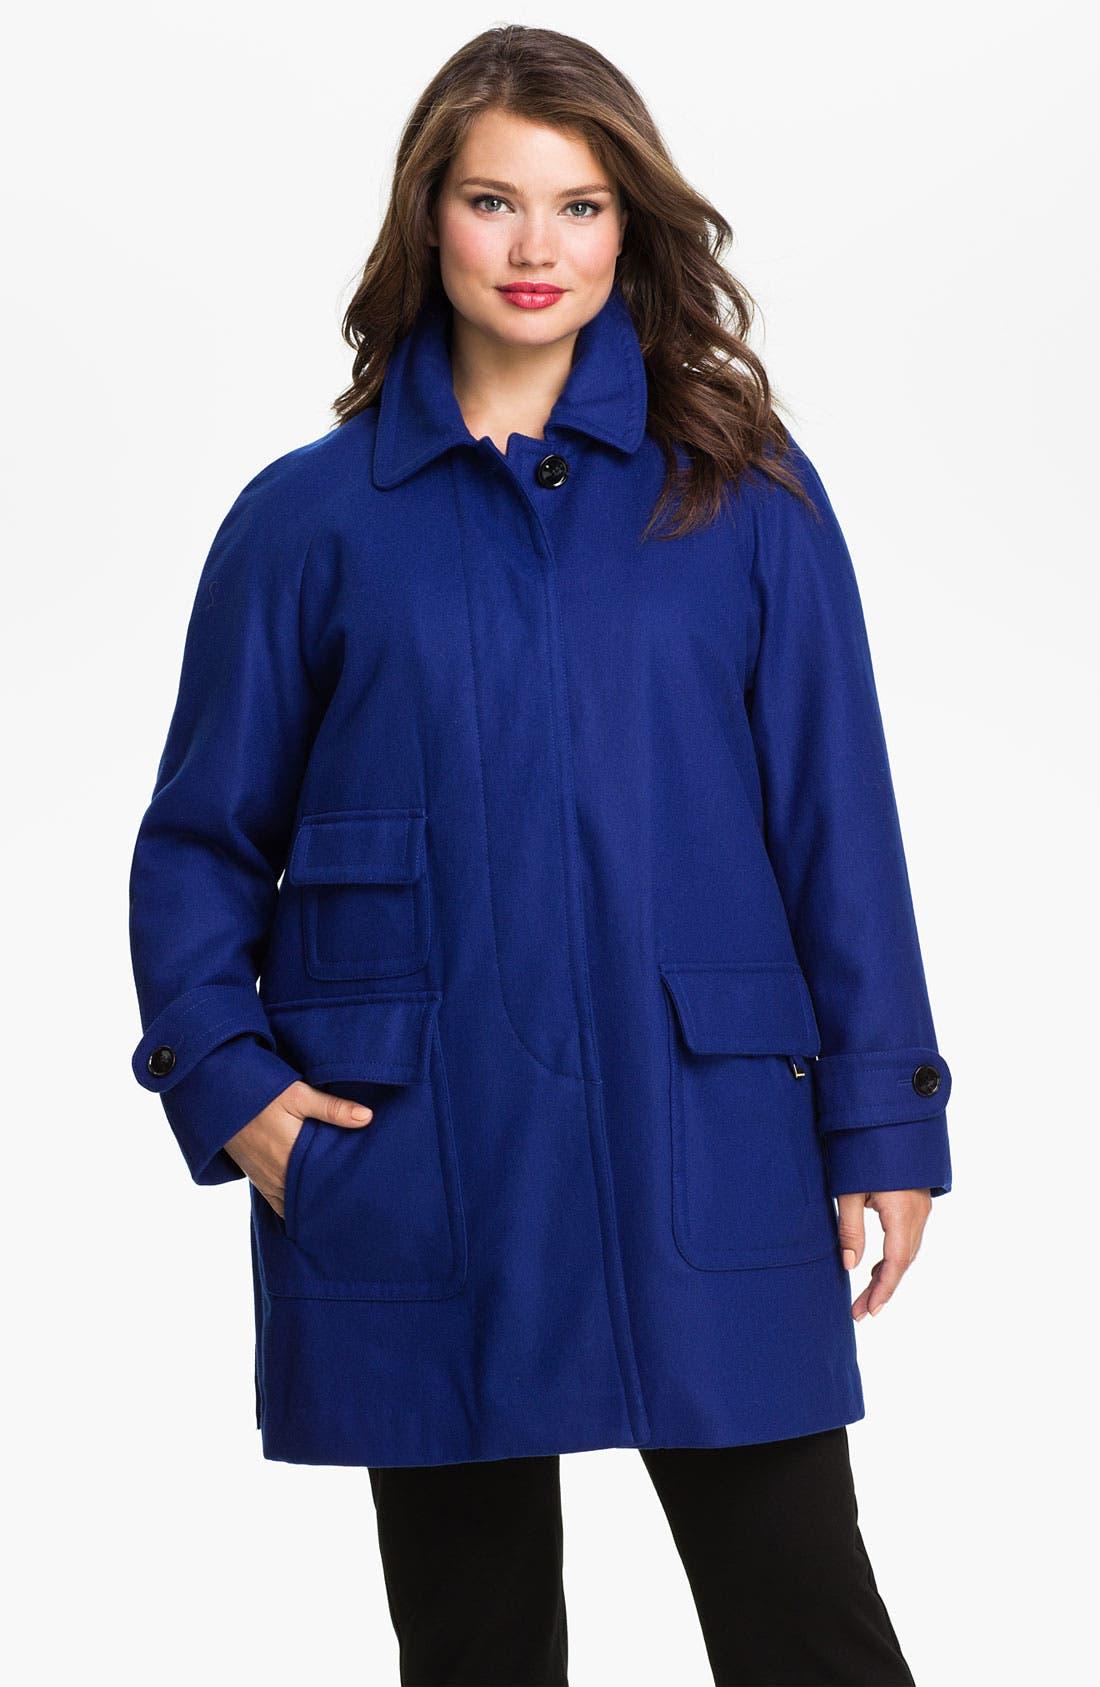 Alternate Image 1 Selected - Ellen Tracy Fly Front Stadium Coat (Plus) (Nordstrom Exclusive)